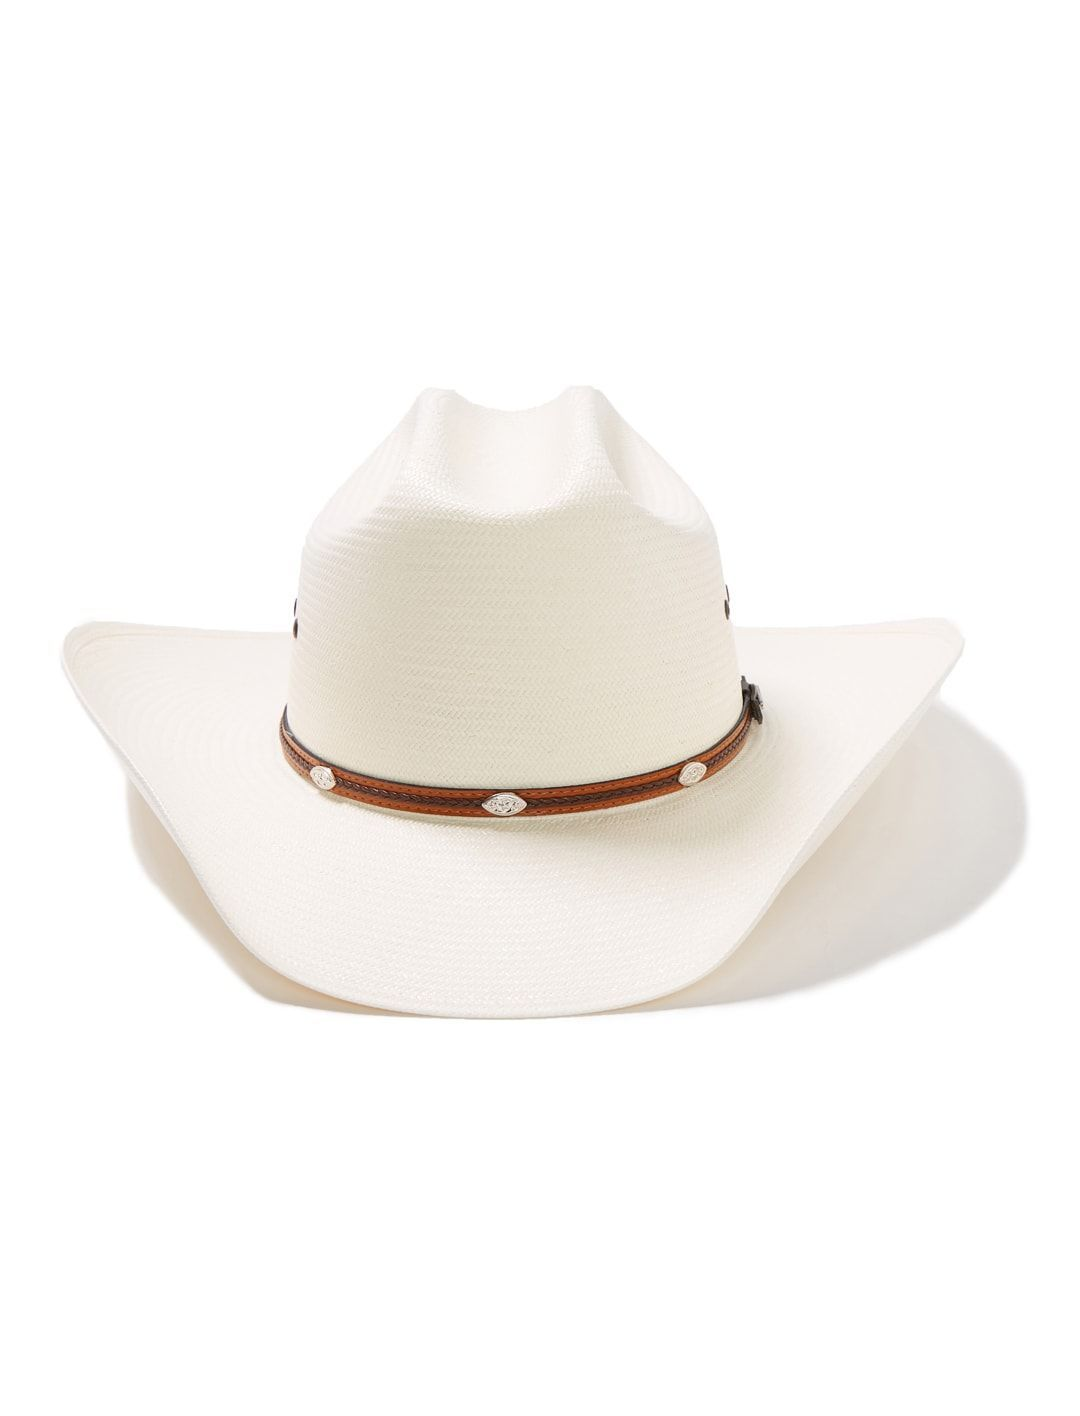 Stetson Men s ALAMO 8X STRAW COWBOY HAT SSALMO-3040 8e4da01fc46